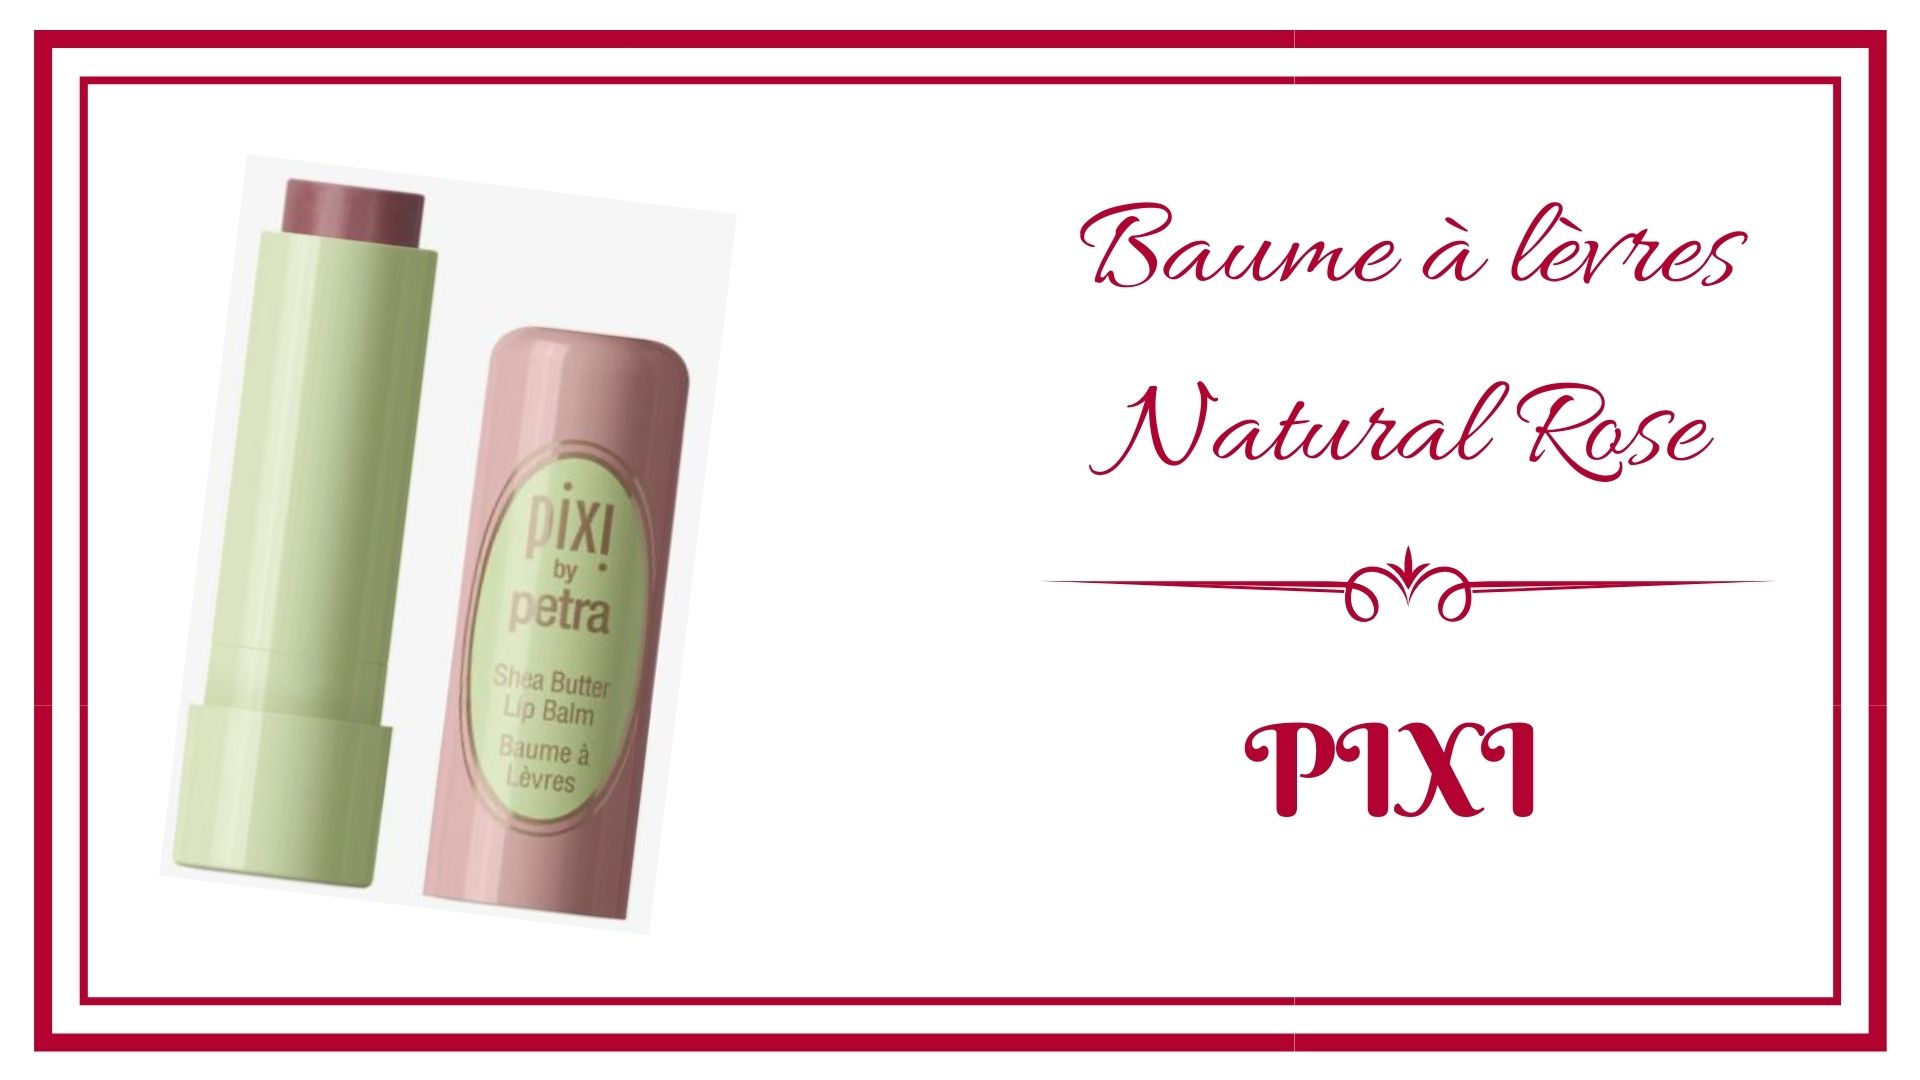 pixi baume à lèvres natural rose  #pixibeauté #sephora# #sheabutterpixi #pixibypetra